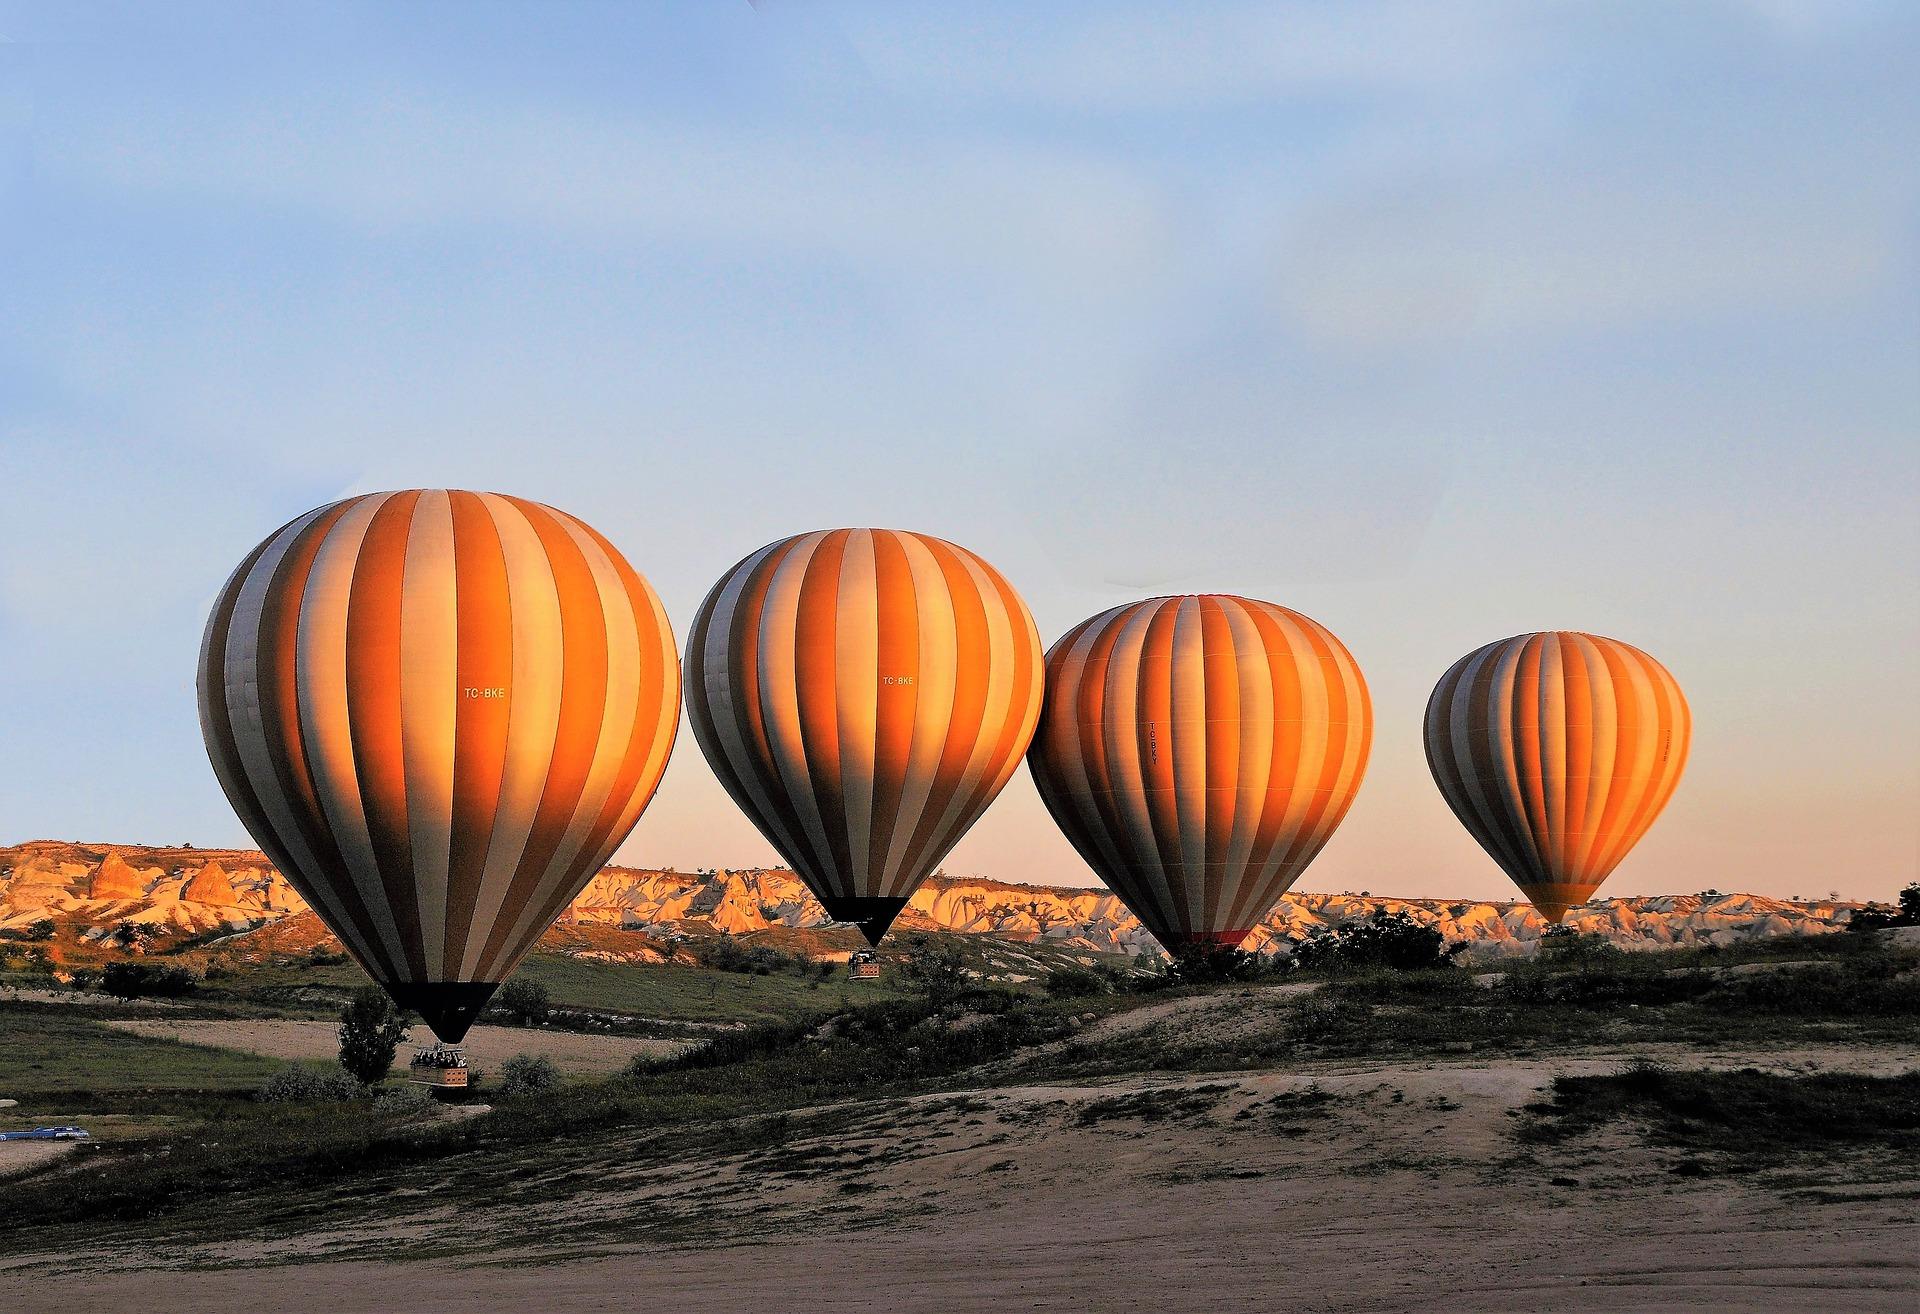 luftballonture i kappadokien, oplevelser i kappadokien, seværdigheder i kappadokien, udflugter i kappadokien, luftballon nevserhir, luftballon kappadokien